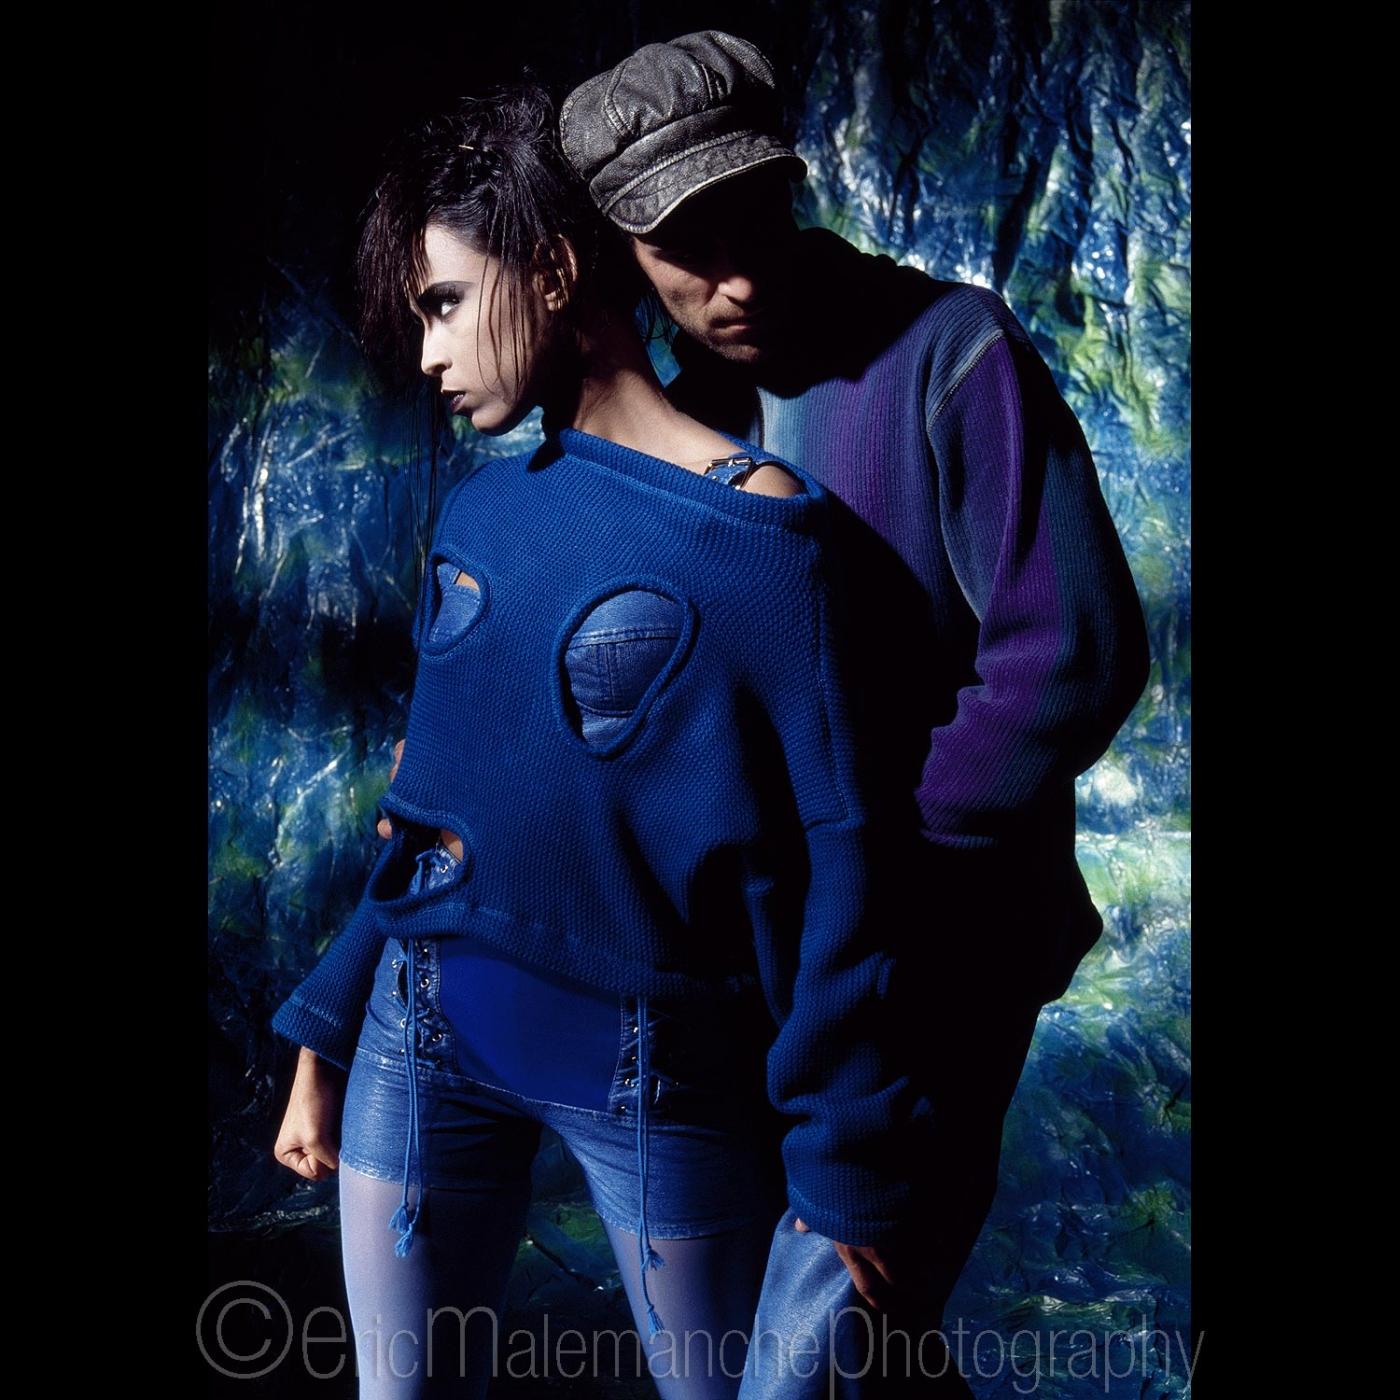 http://www.ericmalemanche.com/imagess/topics/fashion-90-s/liste/Fashion-16.jpg